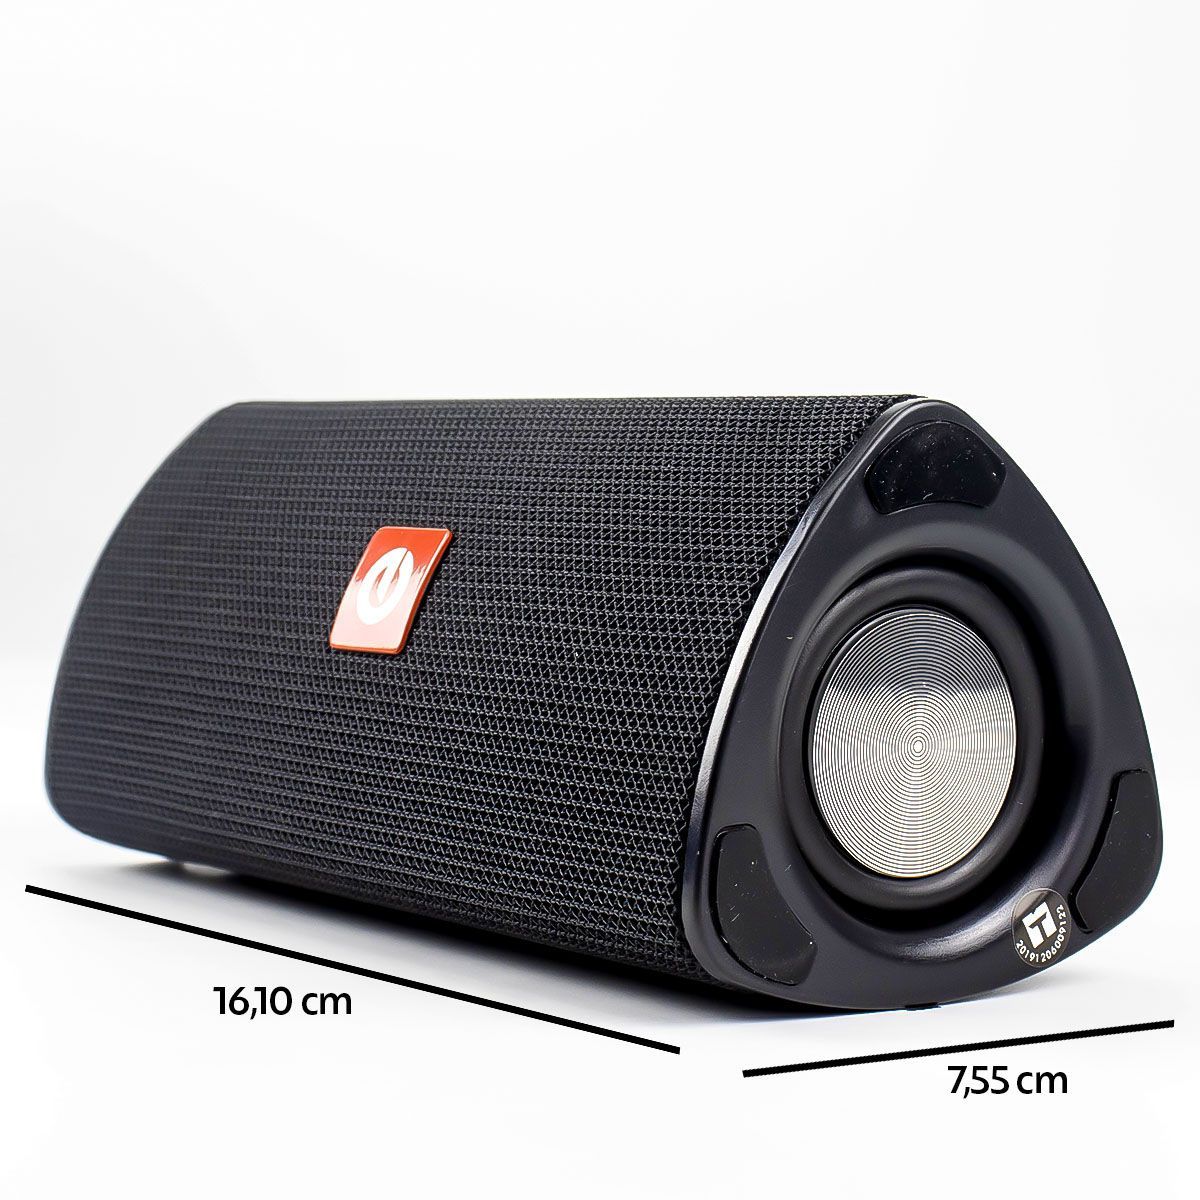 Caixa de Som Bluetooth Portátil Multimídia 10 Watts Rms Exbom CS-M33BT